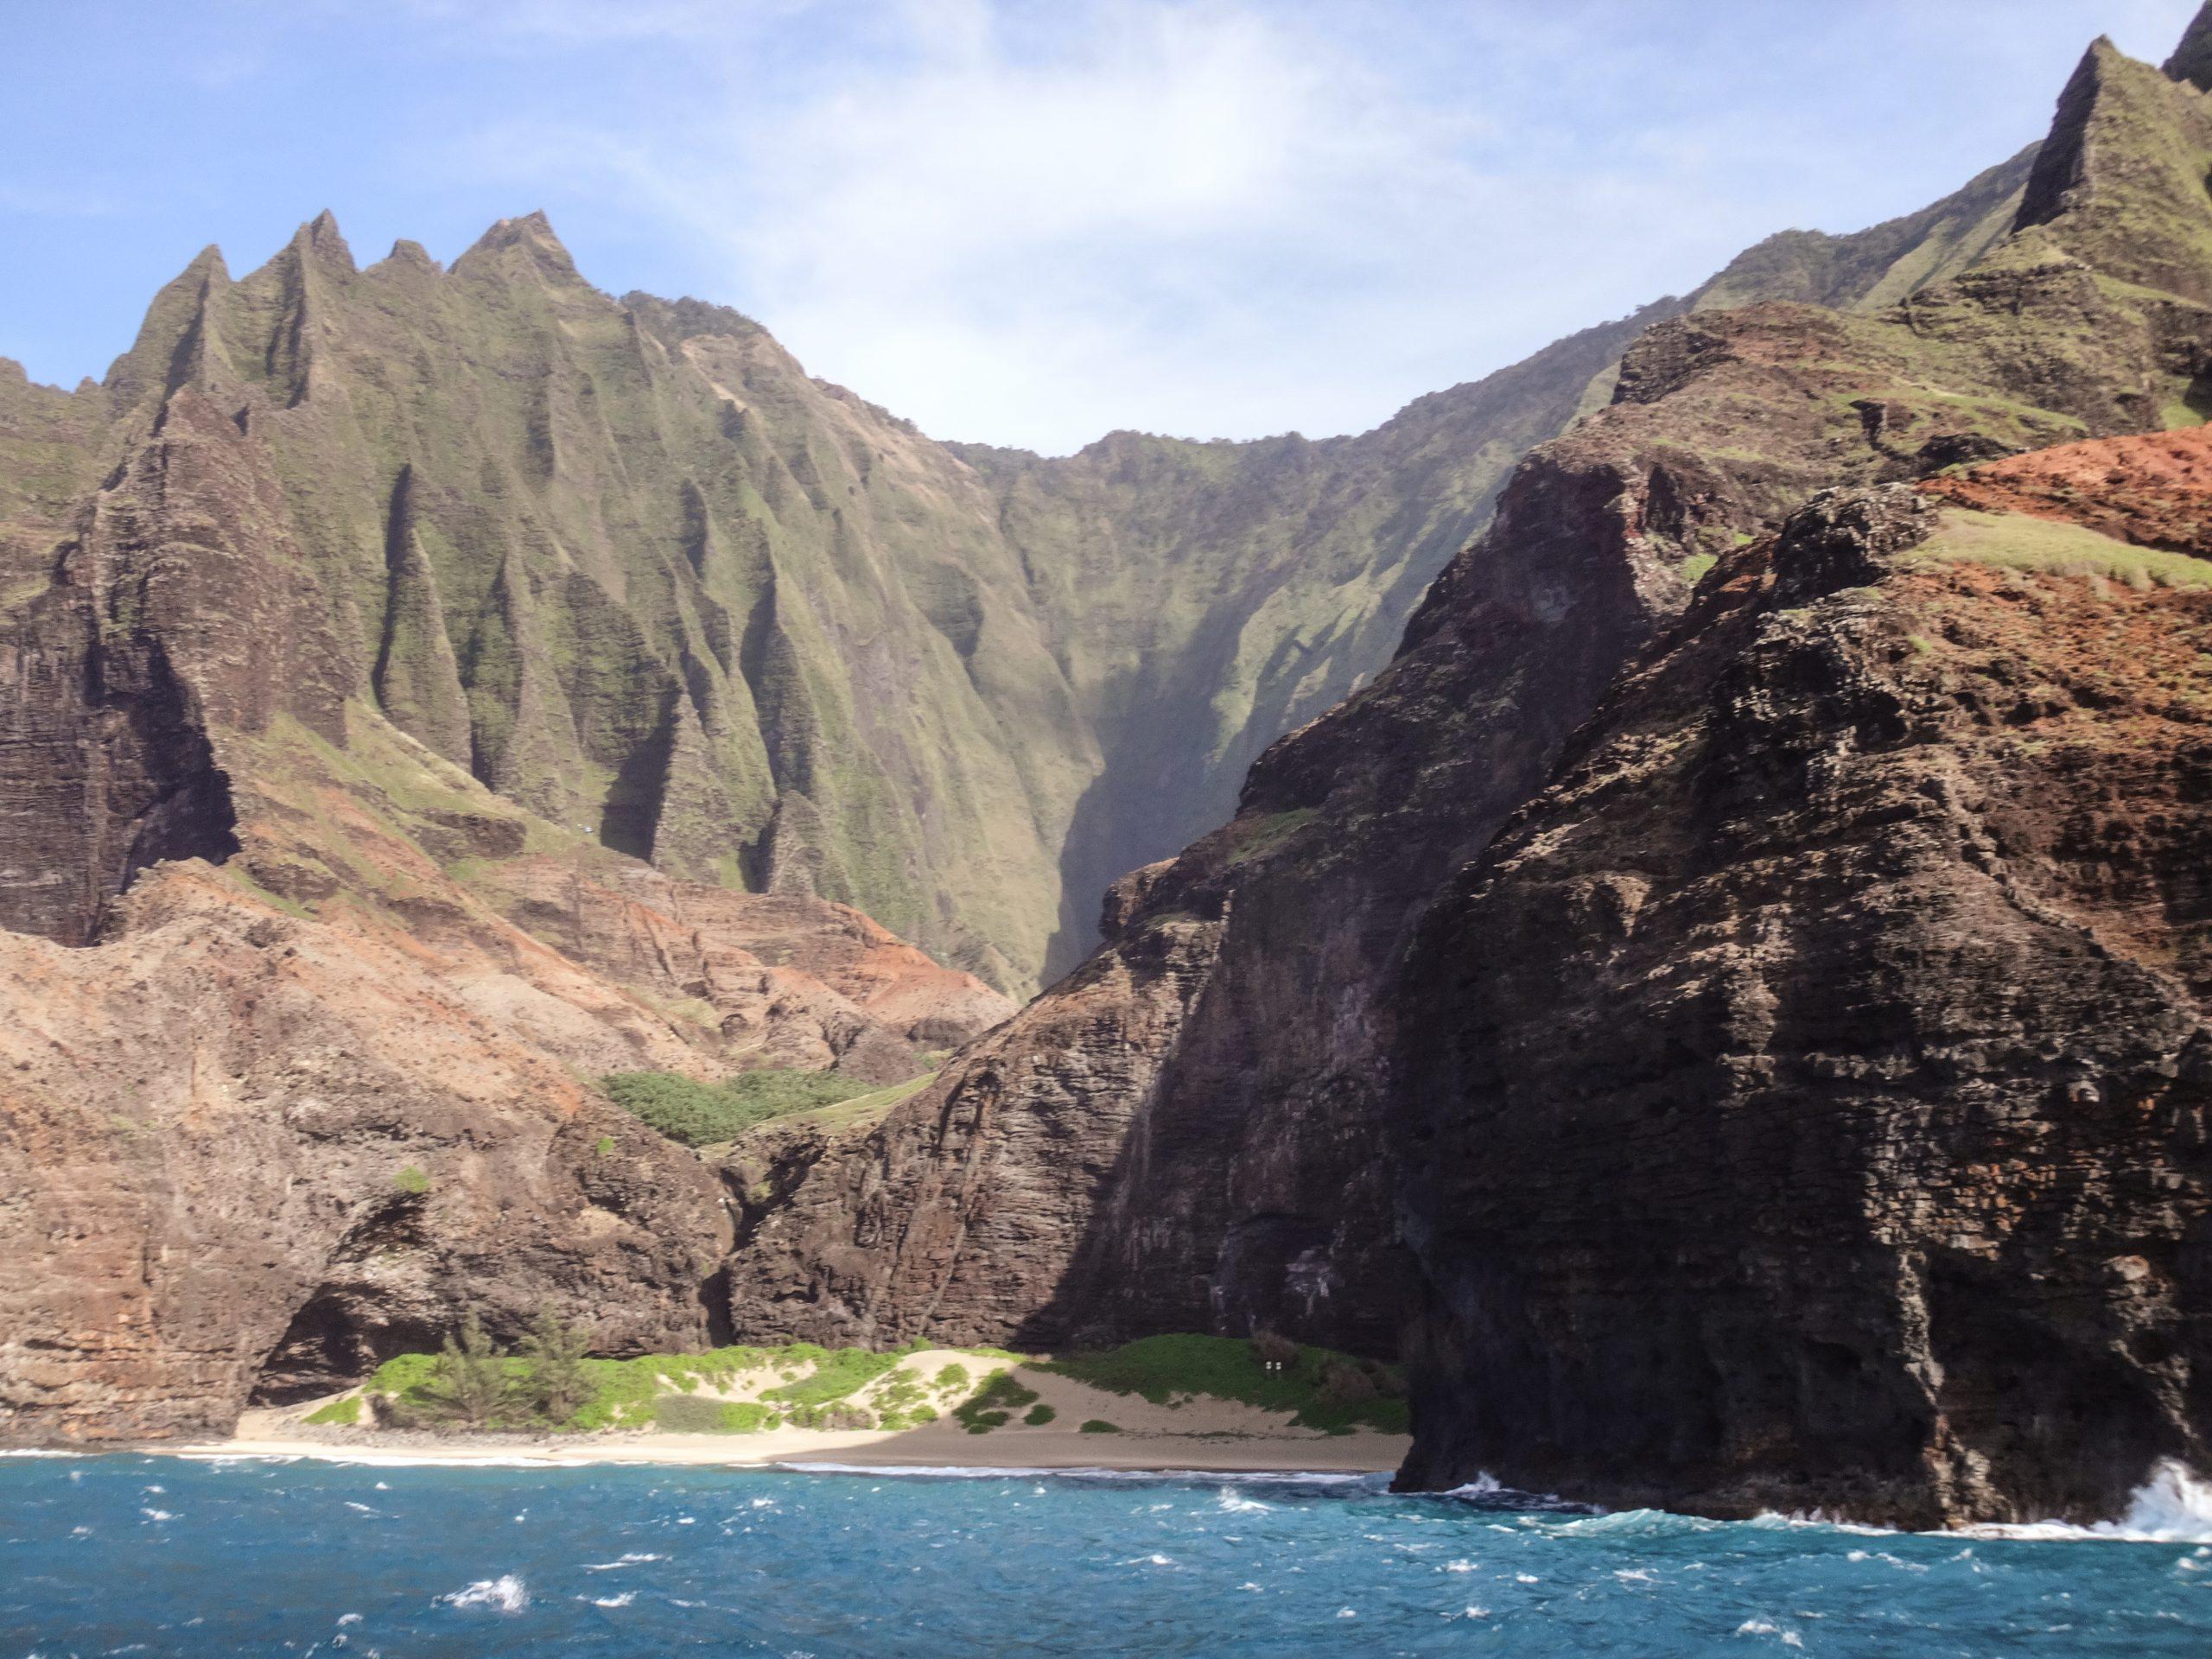 Capt Andy's Catamaran Dinner Cruise, Kauai, Hawaii Na Pali Coast